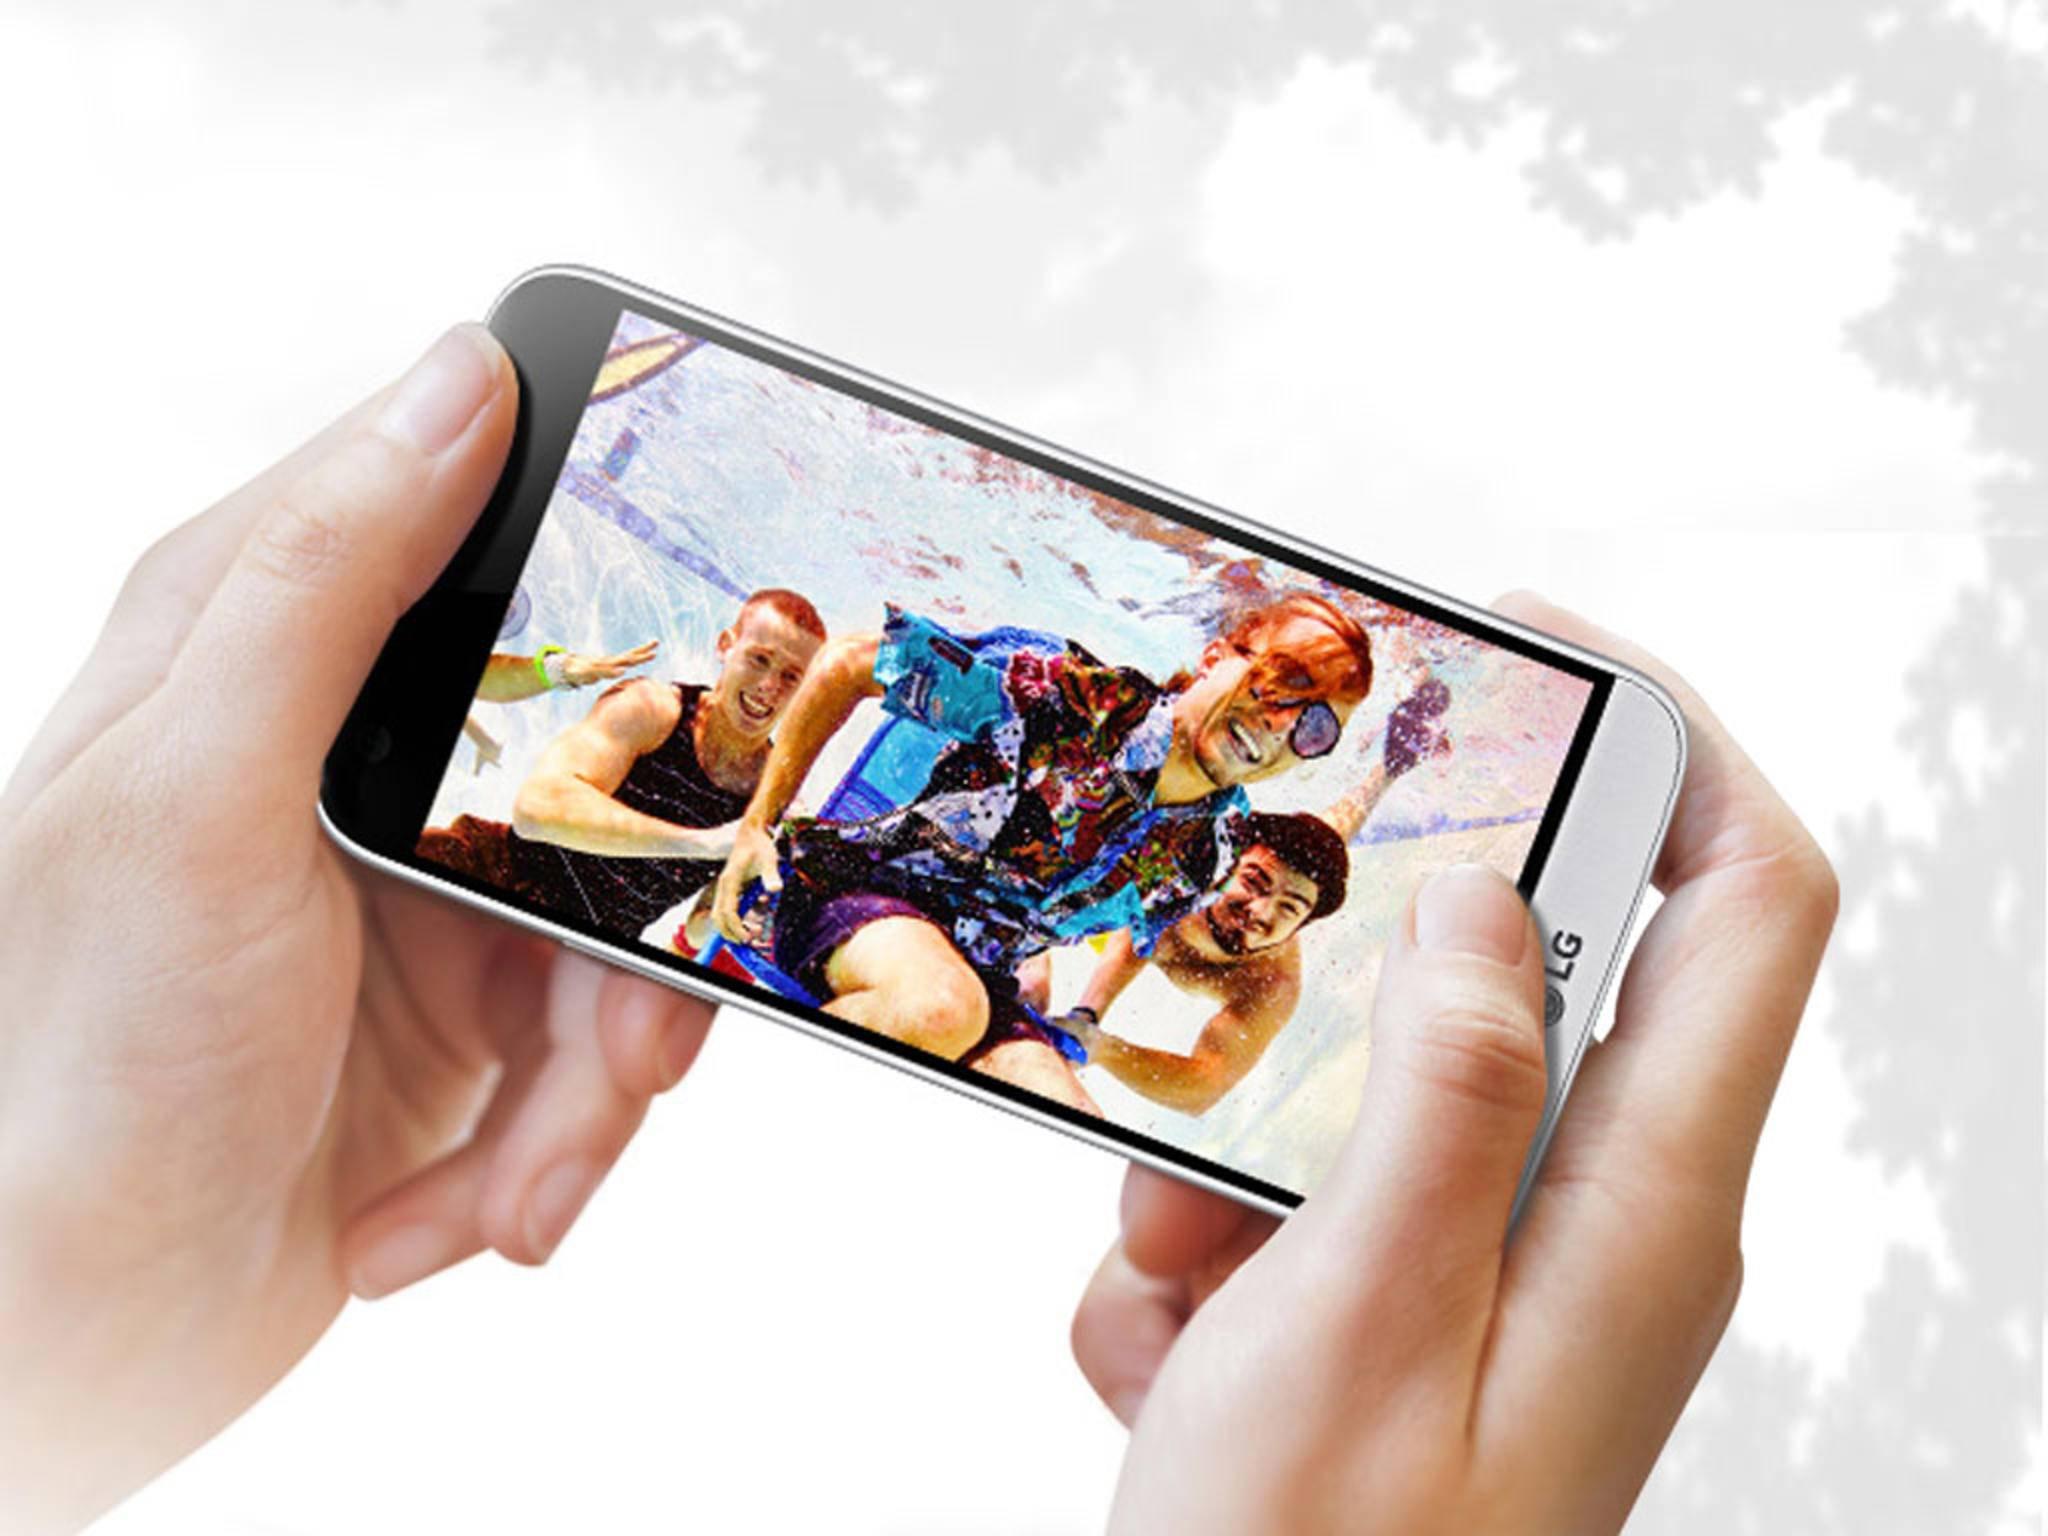 Das LG G5 könnte einen kompakten Ableger bekommen.